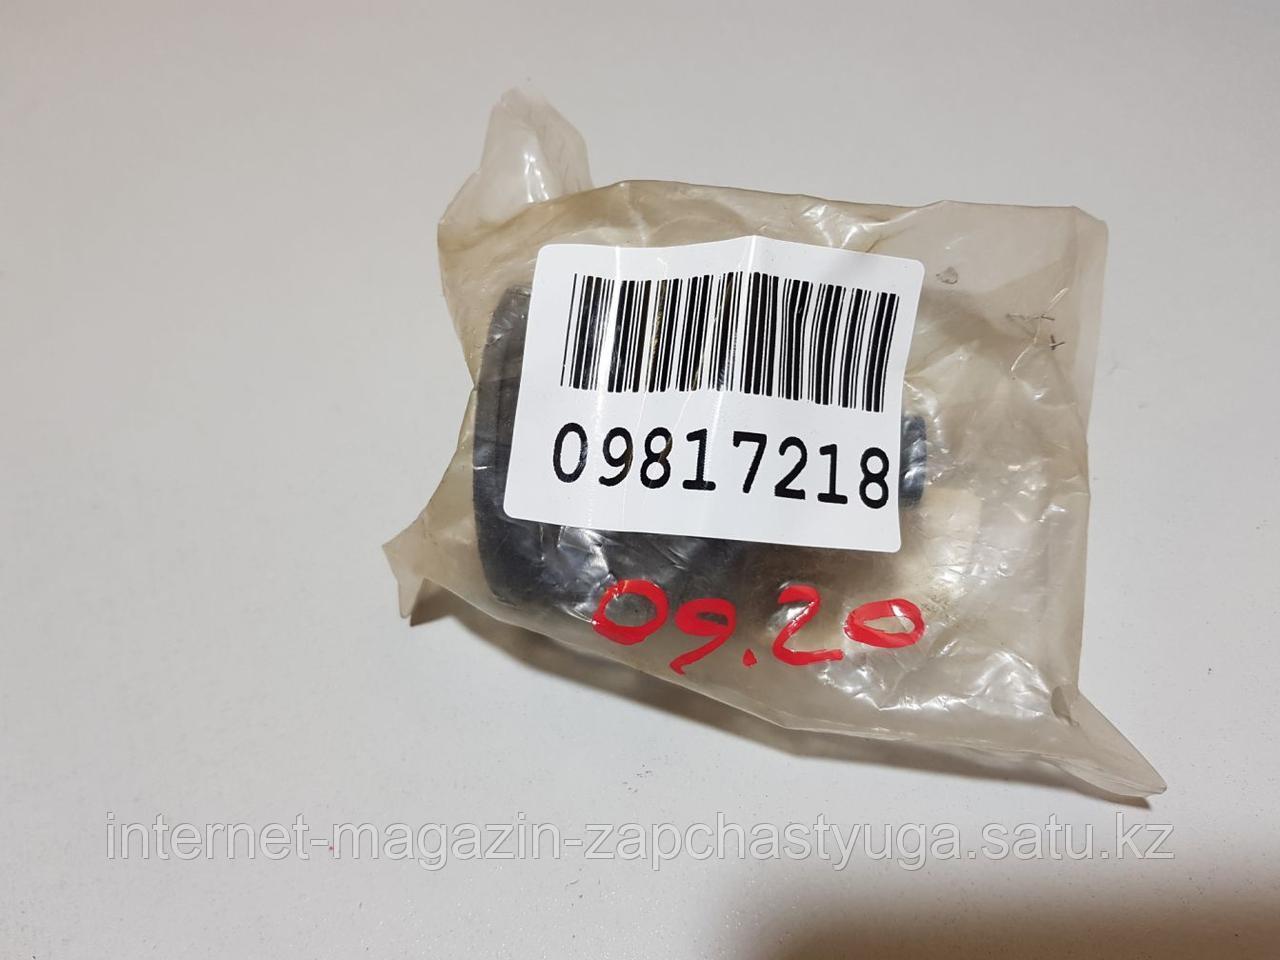 631102J000 Демпфер рамы кузова для KIA Mohave 2008- Б/У - фото 1